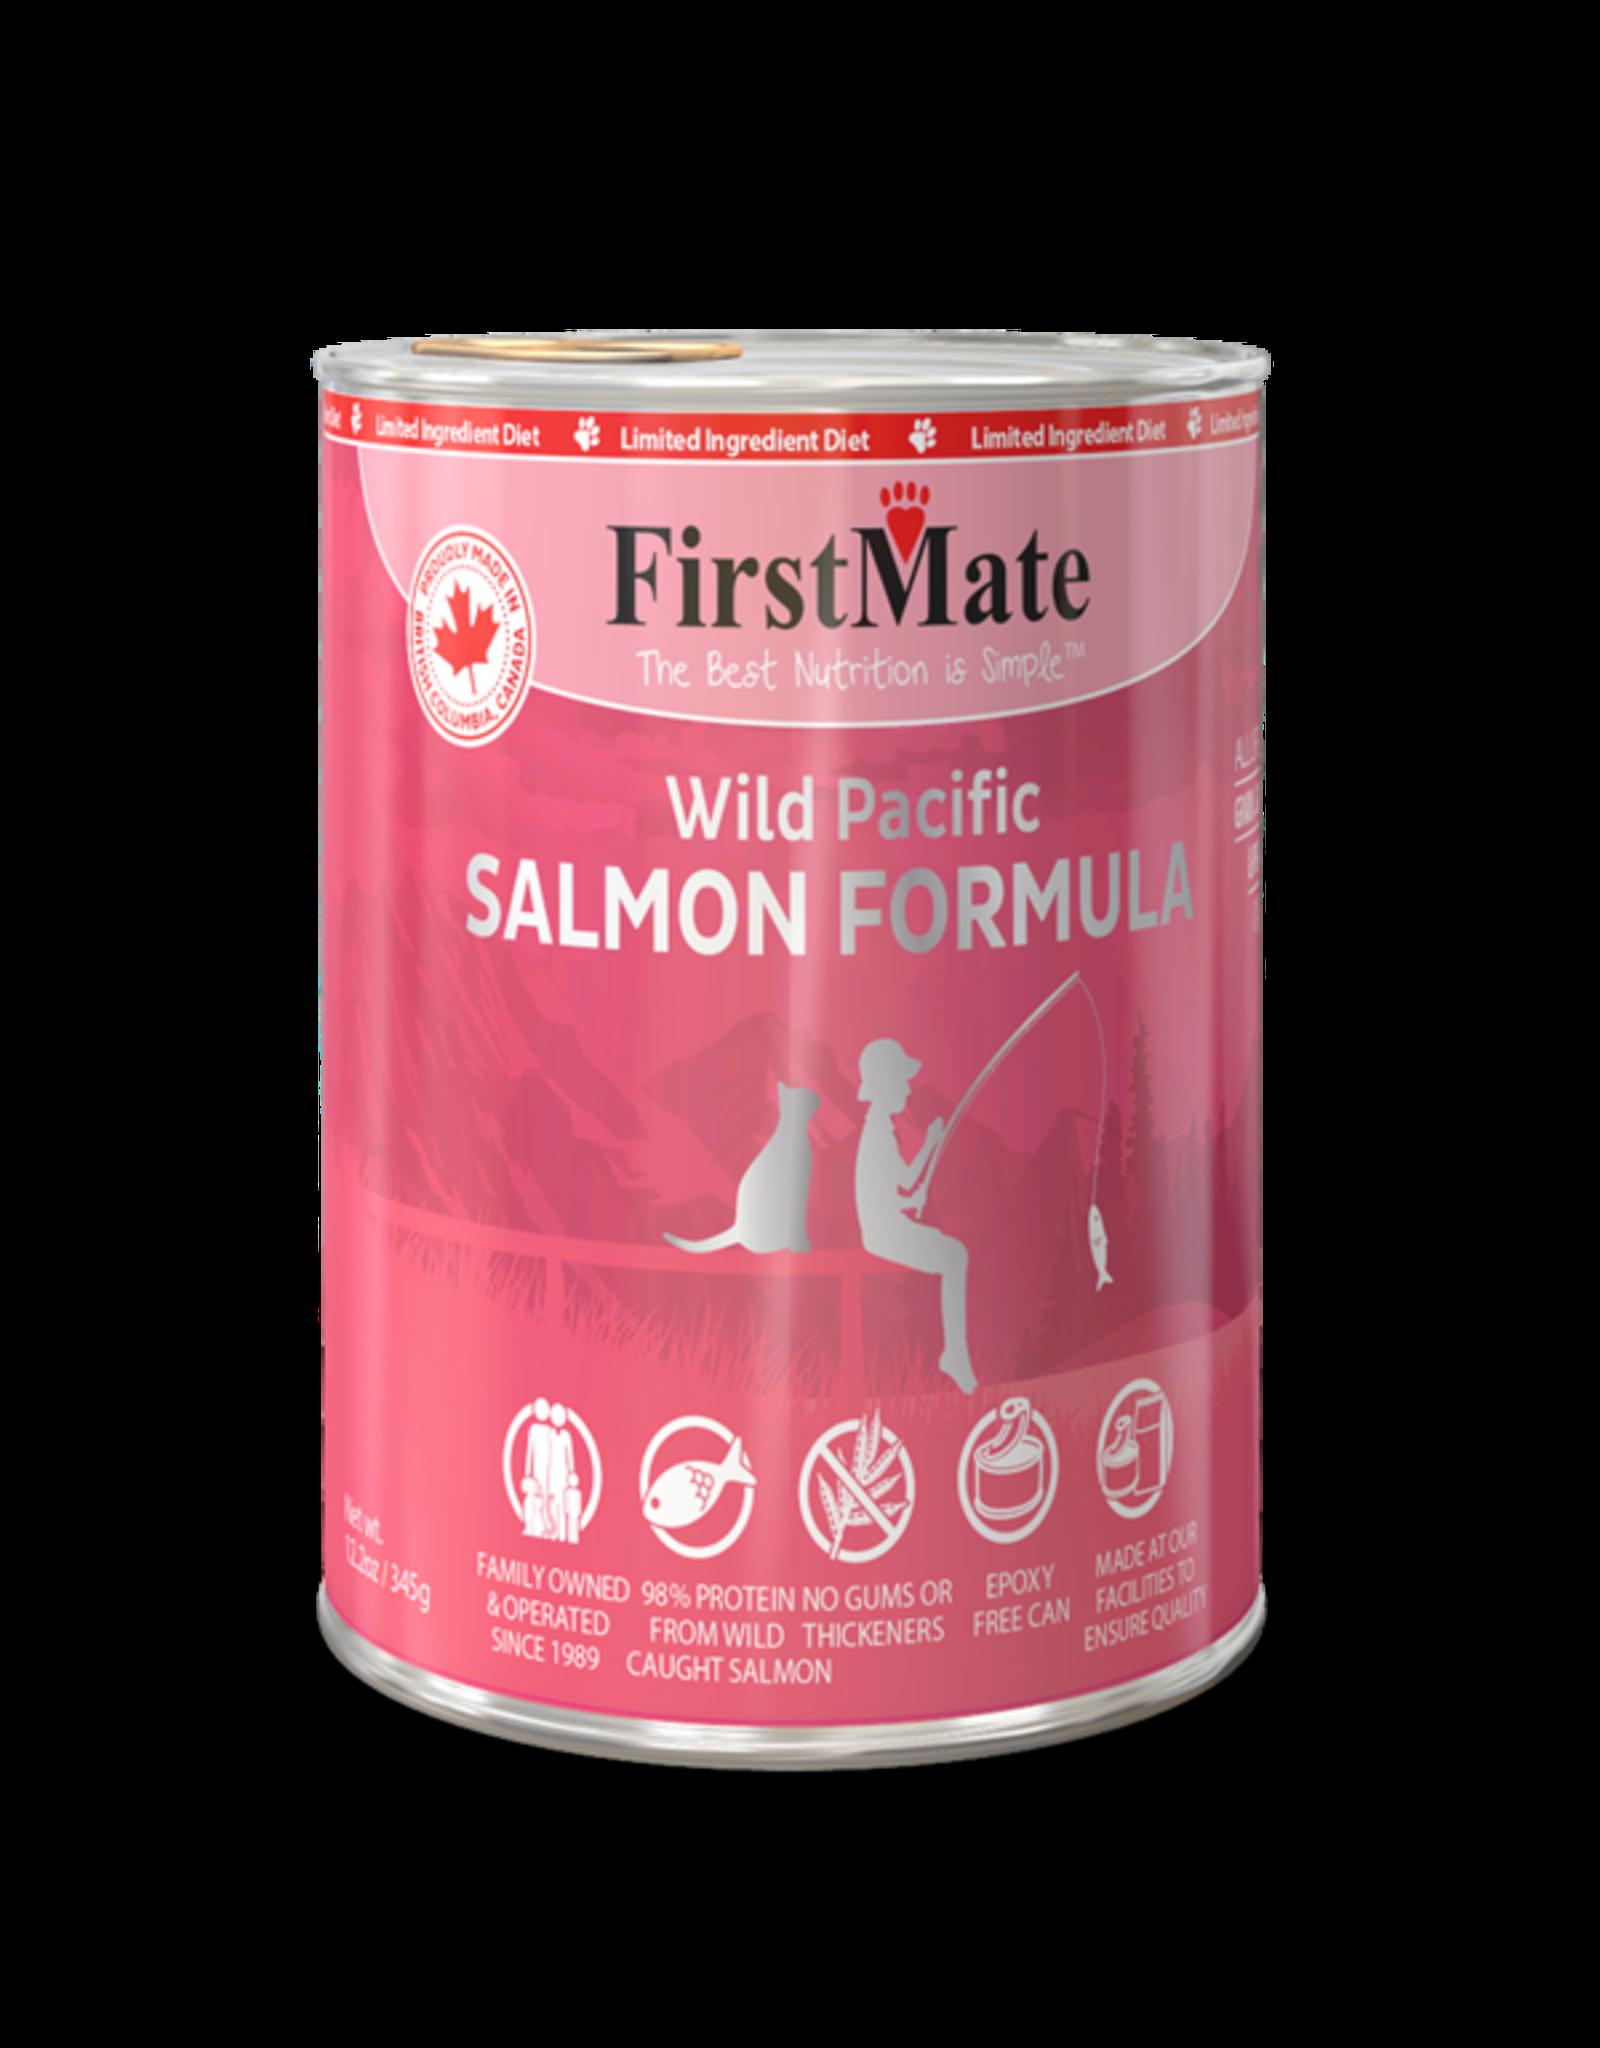 FirstMate FirstMate LID GF Salmon [CAT]